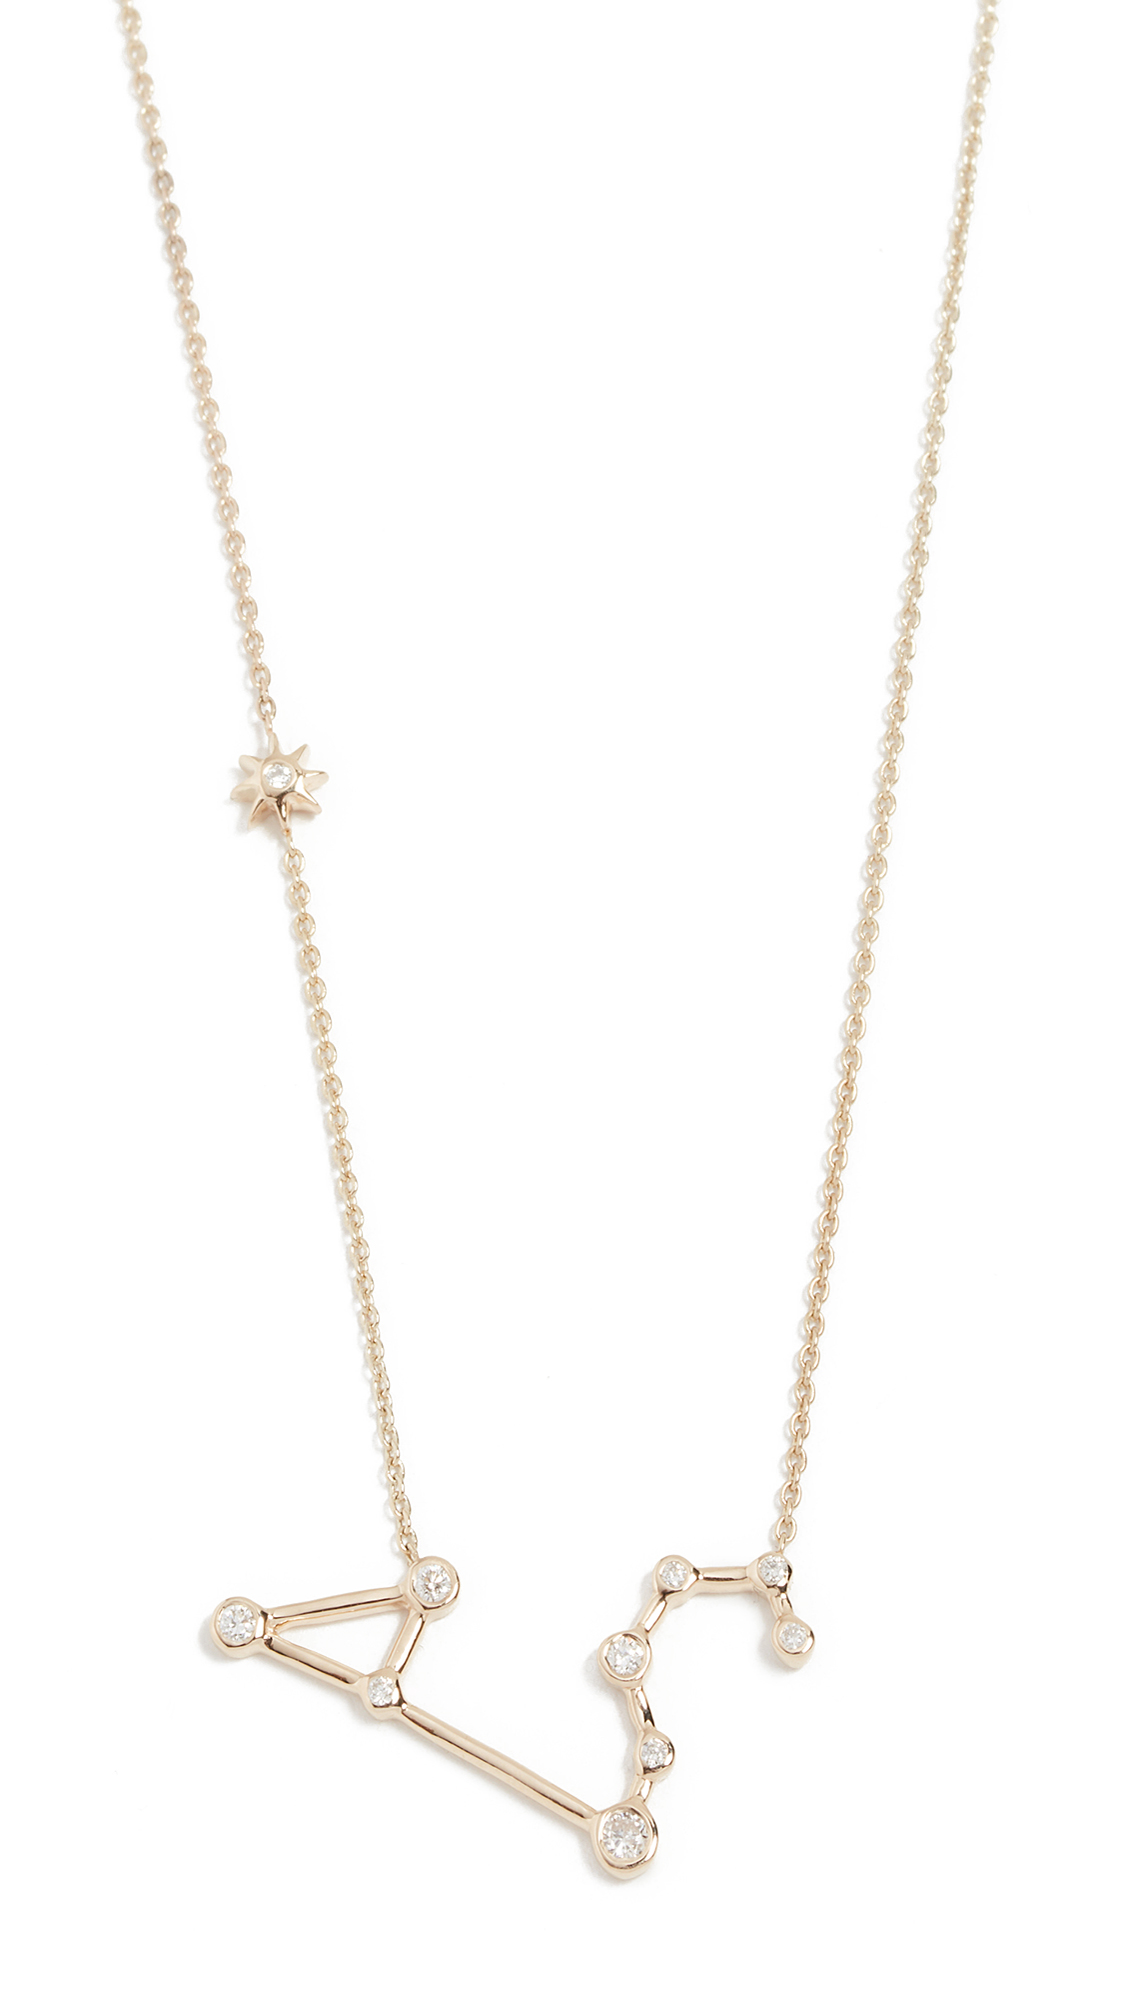 LULU FROST 14K Gold Leo Necklace With White Diamonds